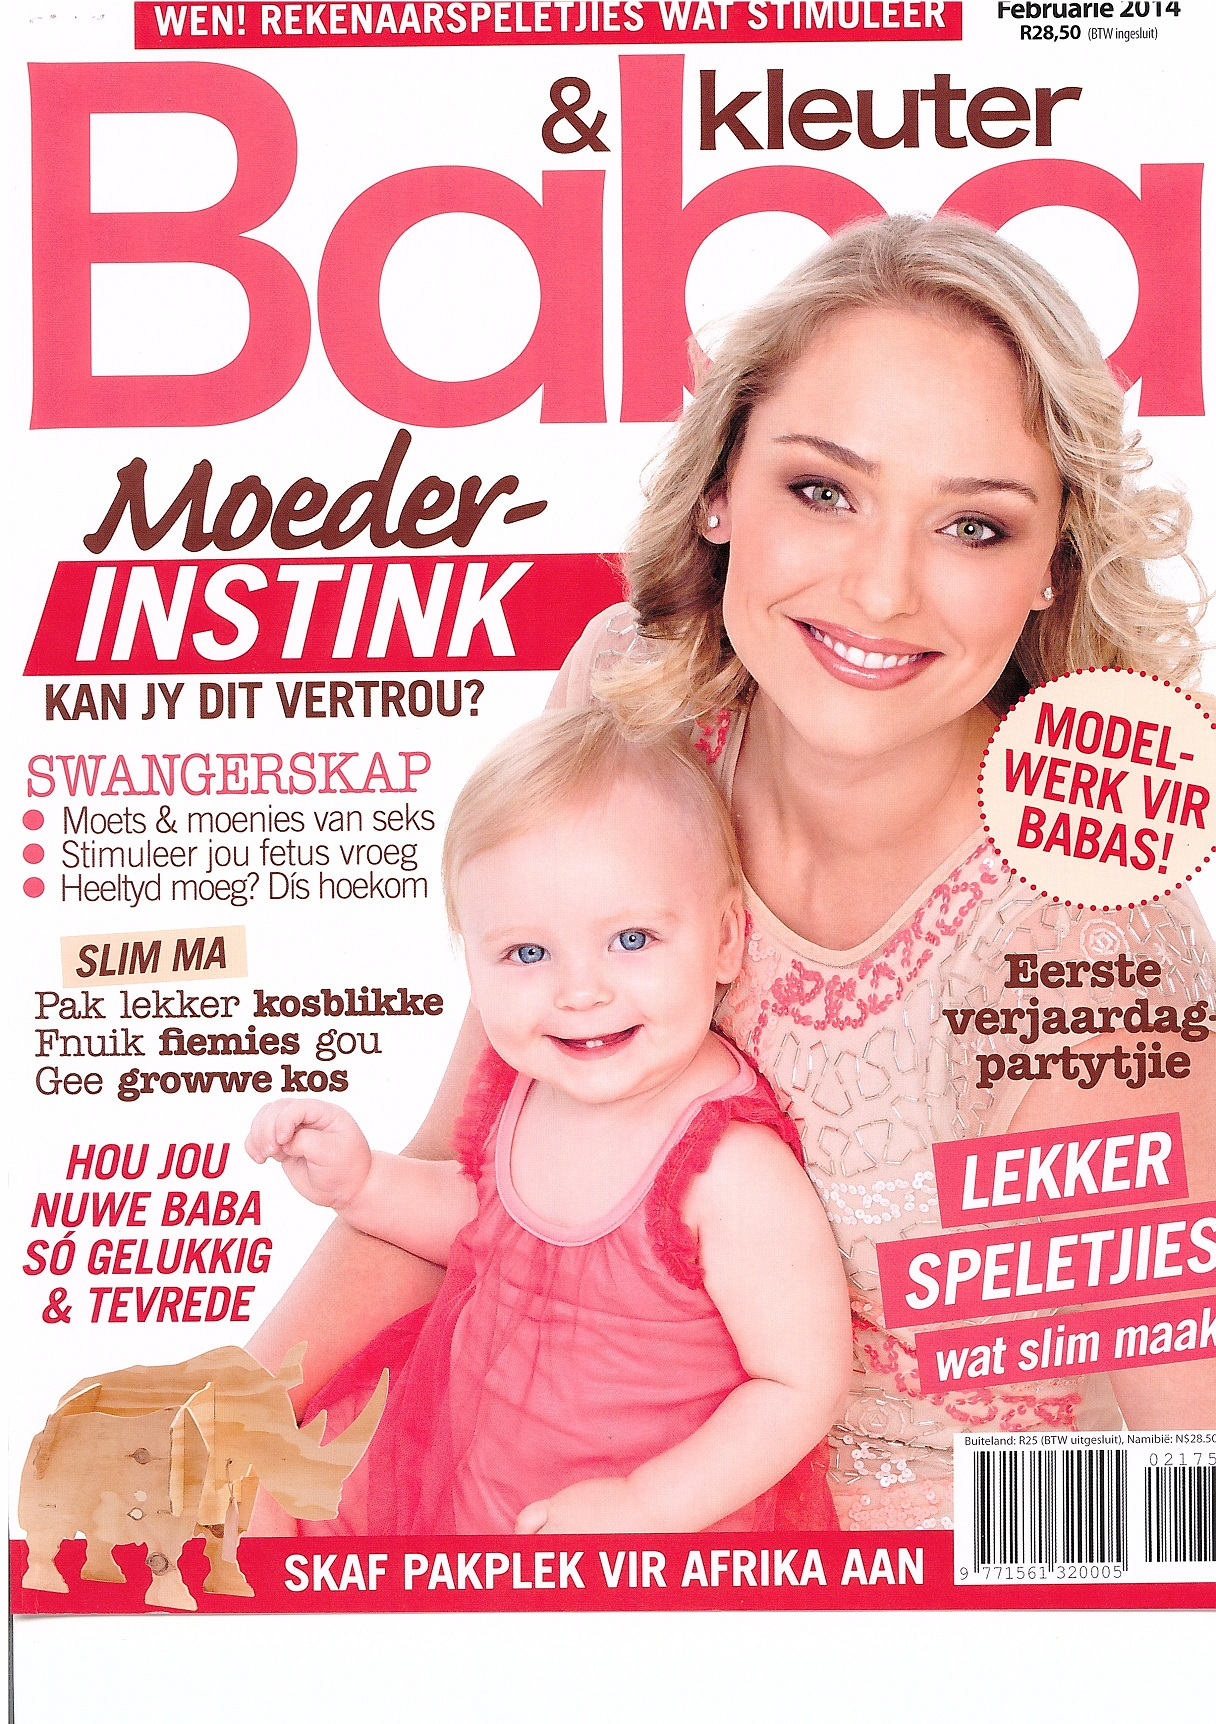 Baba en Kleuter Magazine Feb 2014 Article on Casting Industry Featuring Kool Kids P1